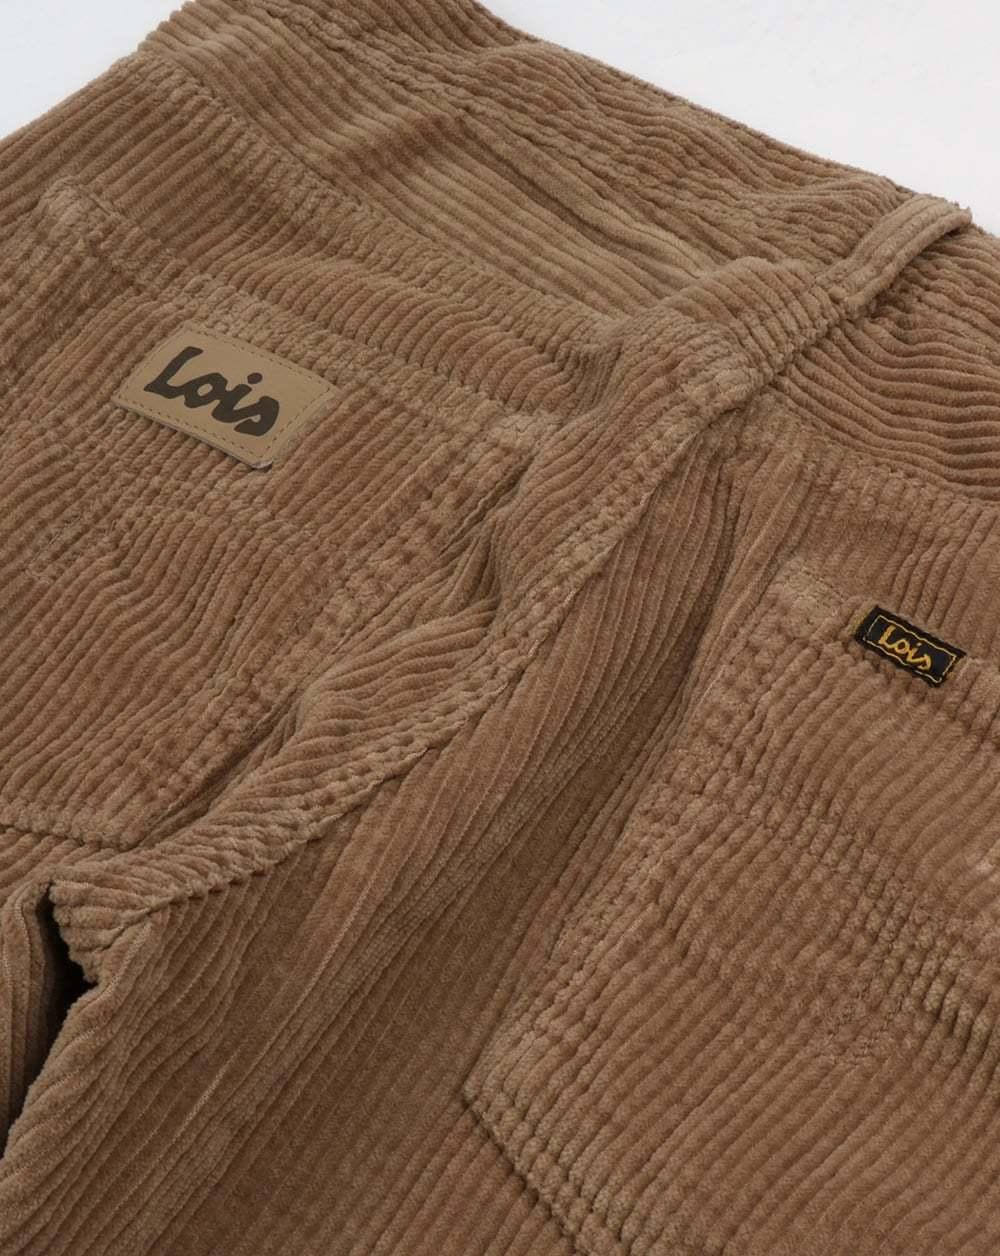 Lois Lois Lois Dallas Jumbo Fili nella sabbia scuro-CULT 80 S SPAGNOLO Denim Jeans Pantaloni 6b286c